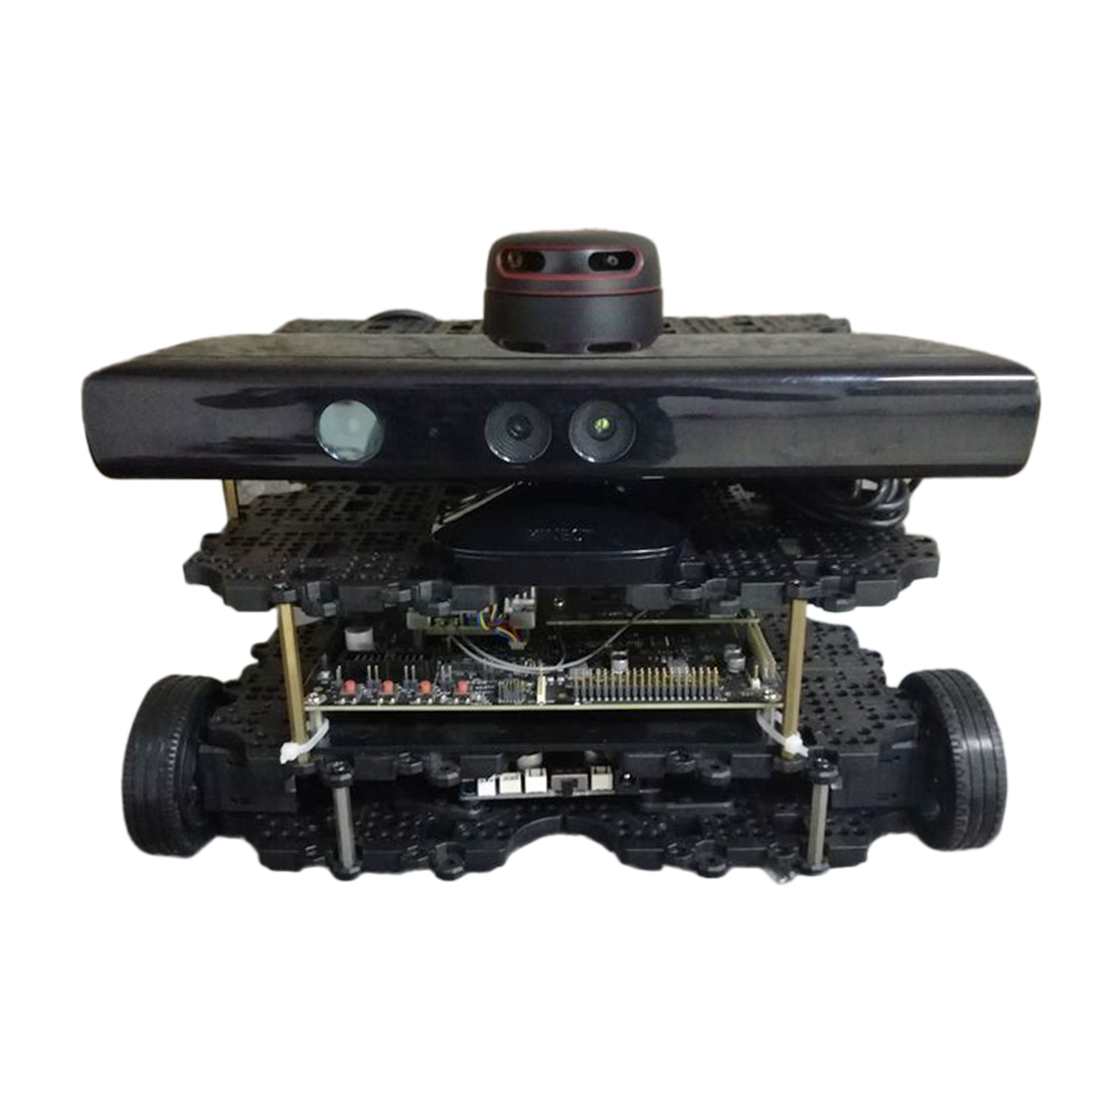 Waffle Version Robot Operating System Autopilot Robot Car Open Source Kit For Children Kids Developmental Early Educational Toys